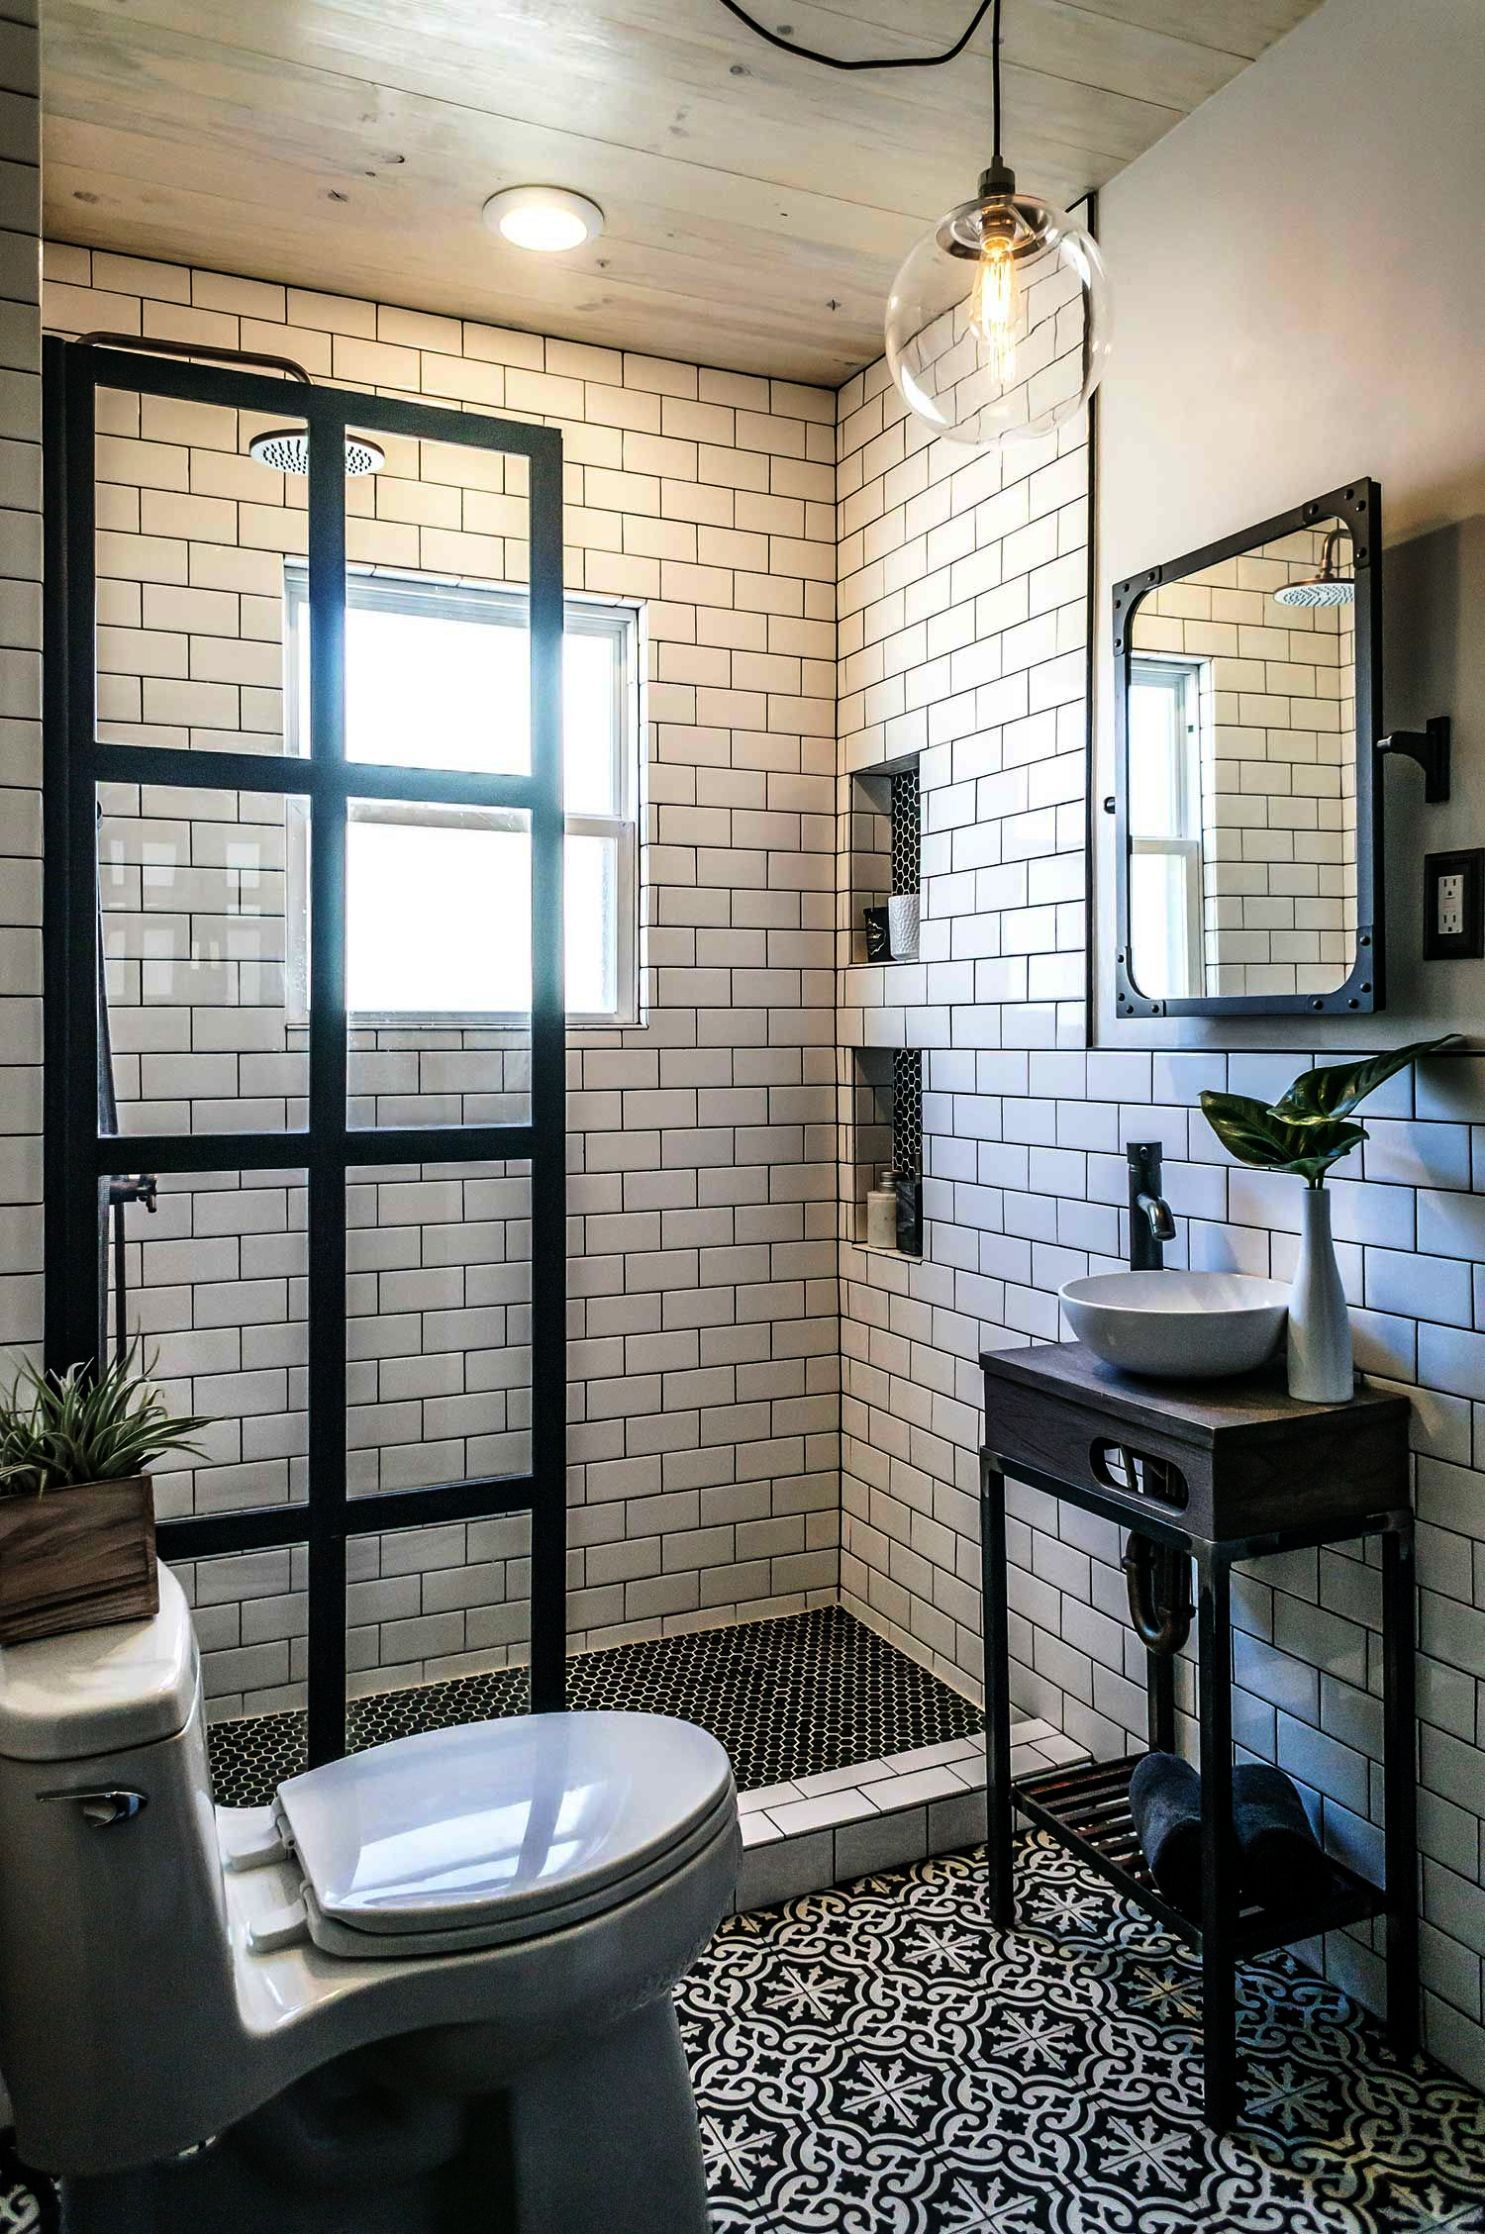 Great Rustic Bathroom Decor Pinterest Bathroom Design Small